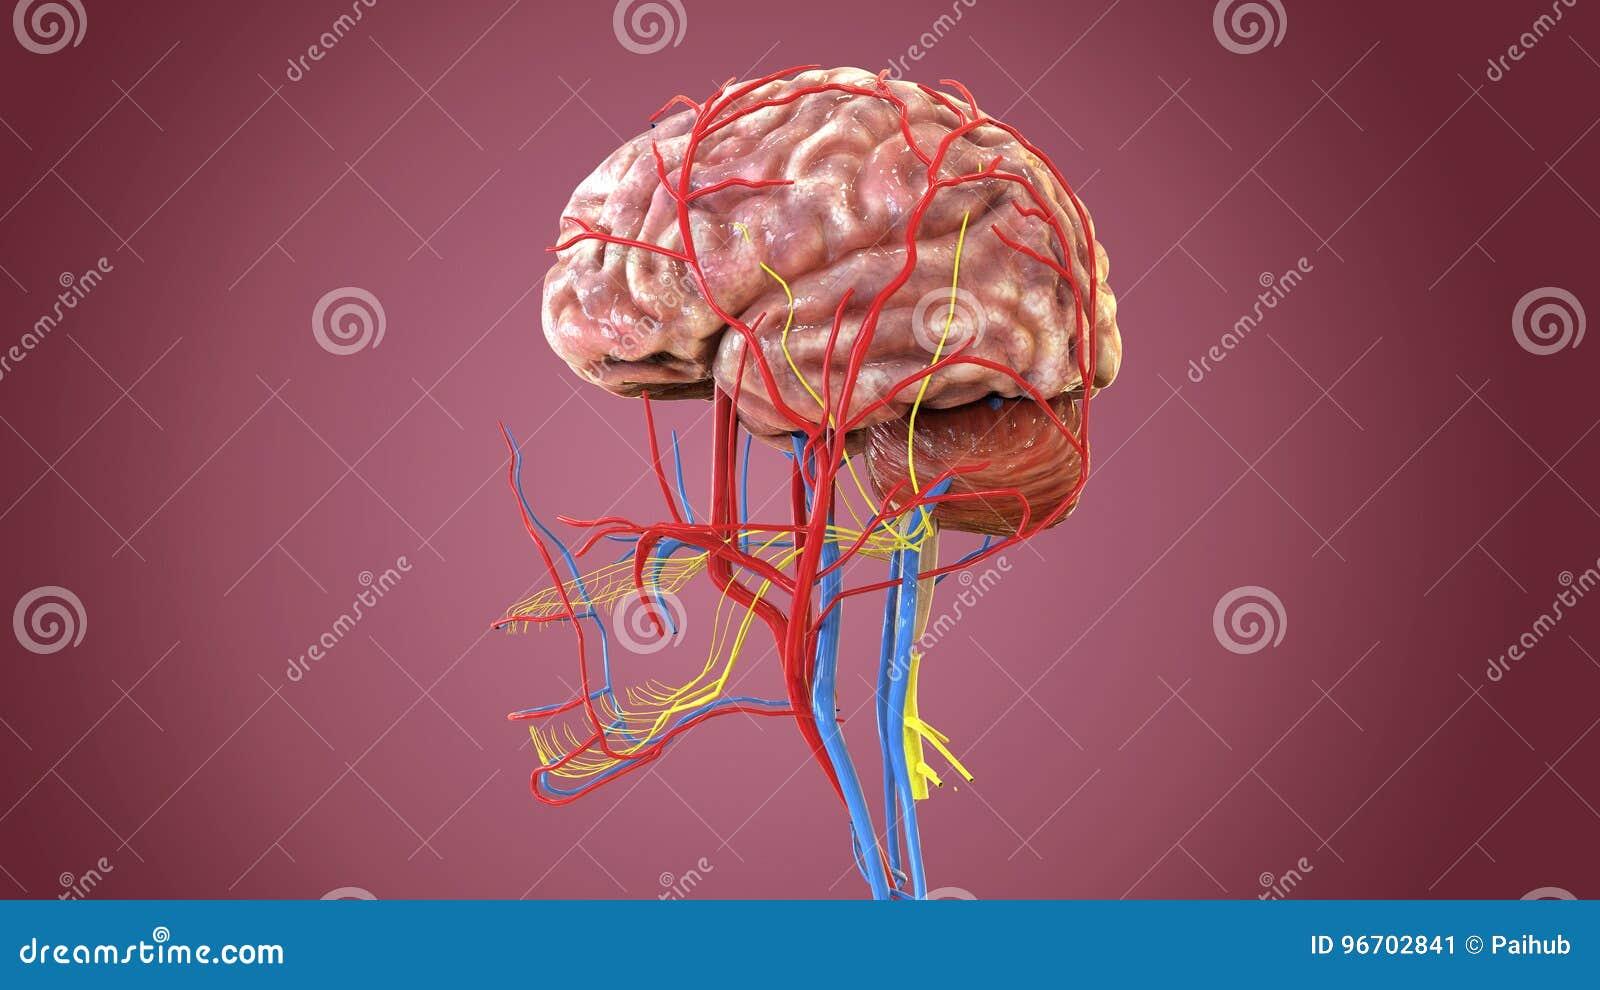 3d Illustration Of Human Body Brain Anatomy Stock Illustration ...